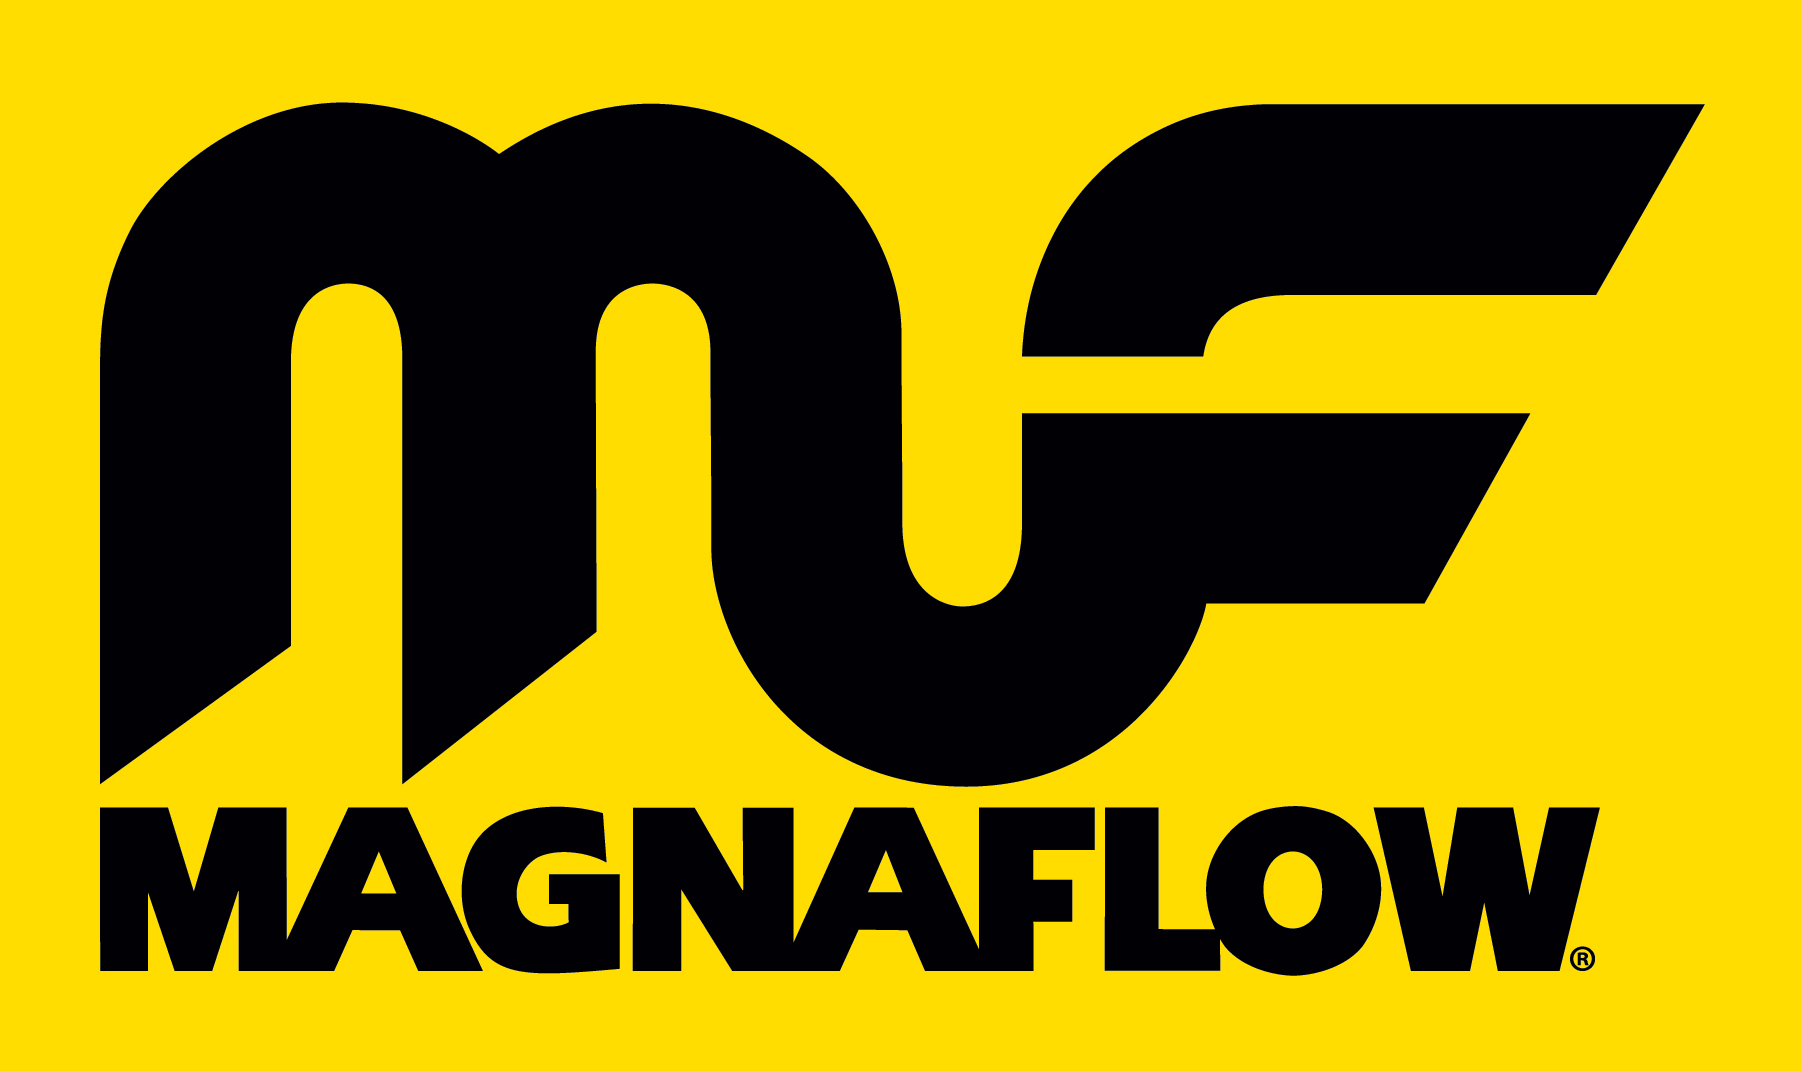 mf_magnaflow_lg6wFkWtiNAHmVC